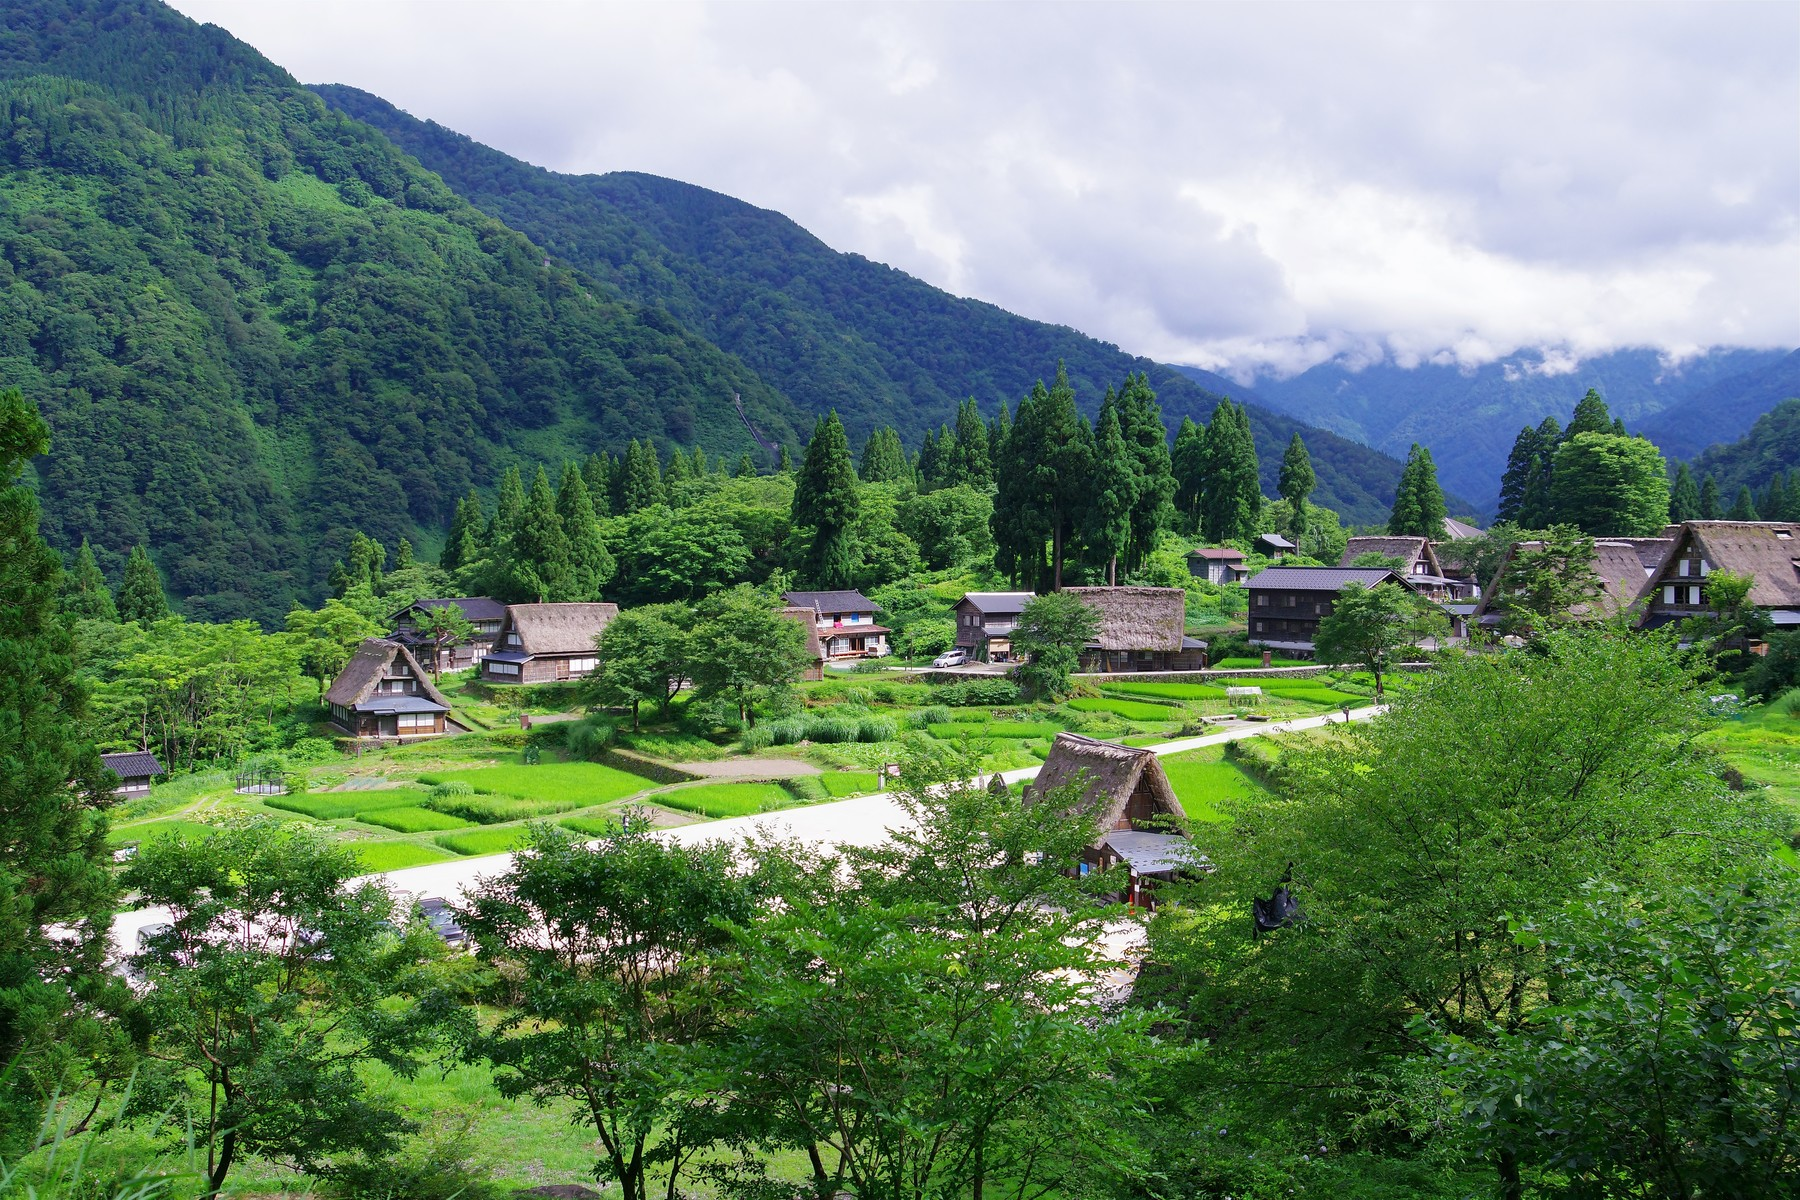 相倉集落(五箇山合掌造り集落)の作例写真